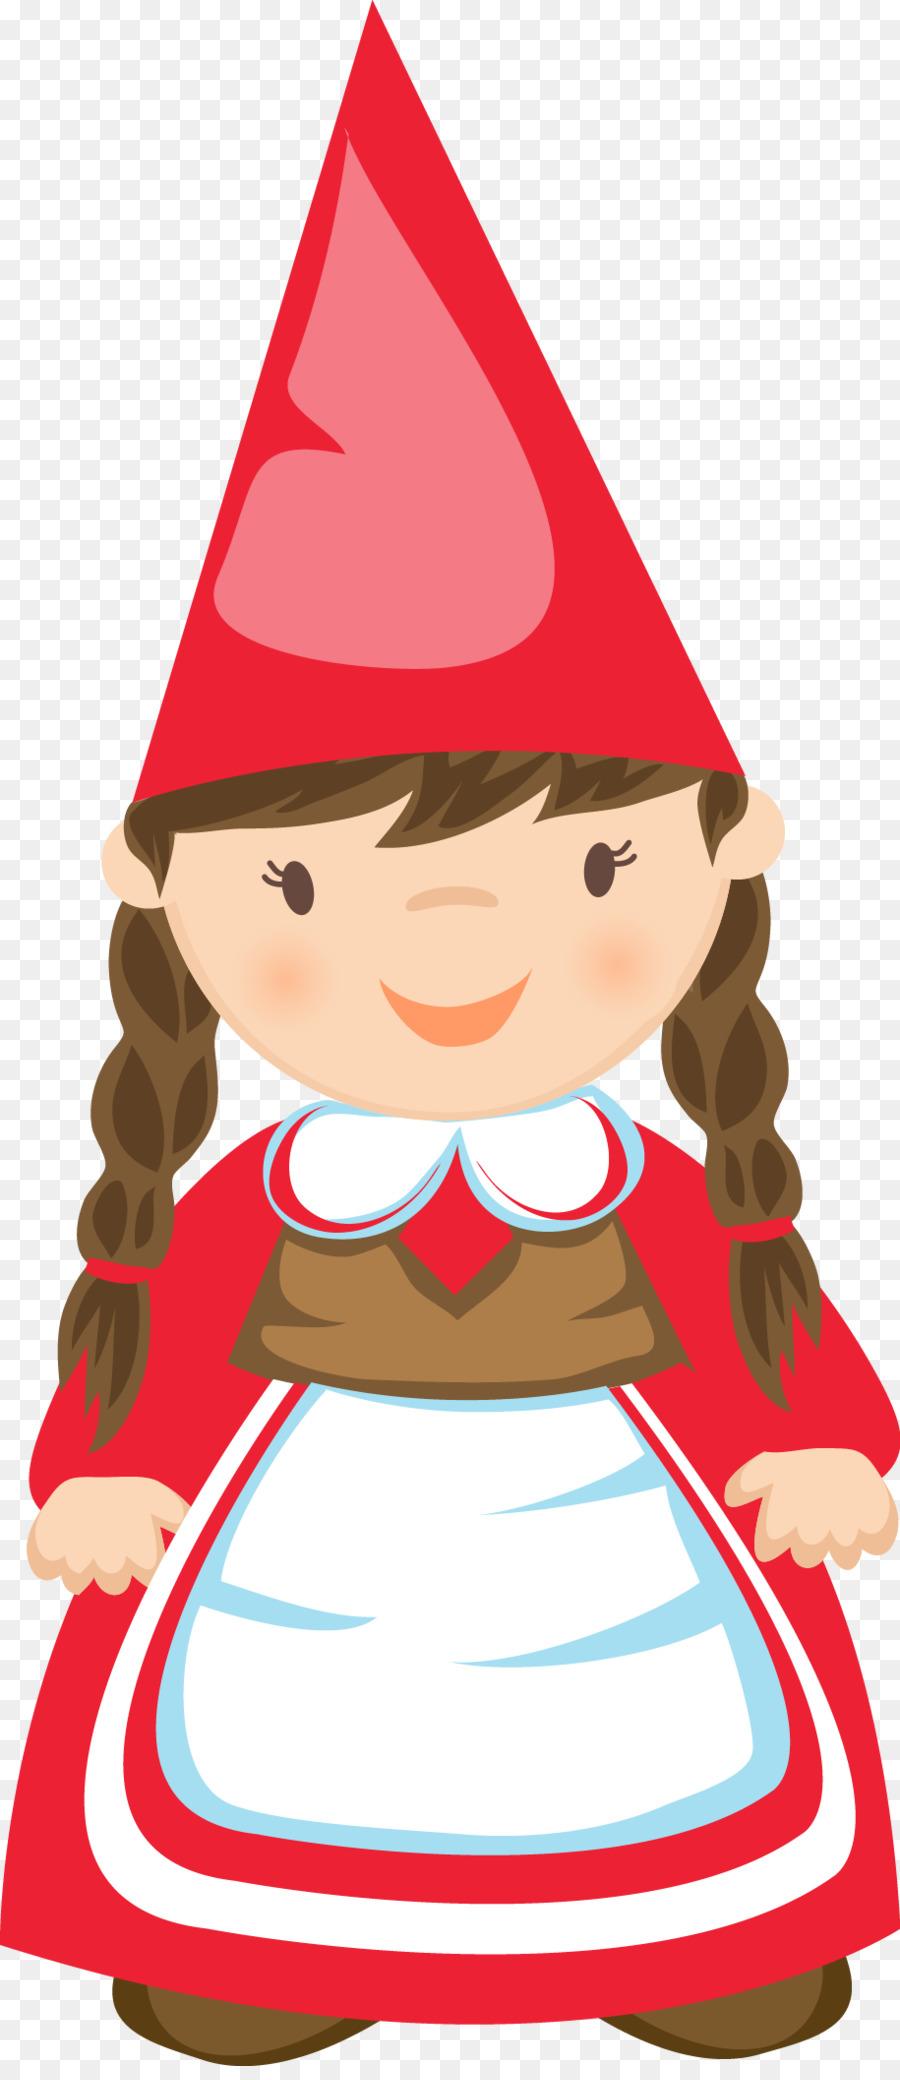 Christmas Gnomes Clipart.Christmas Tree Art Clipart Gnome Illustration Christmas